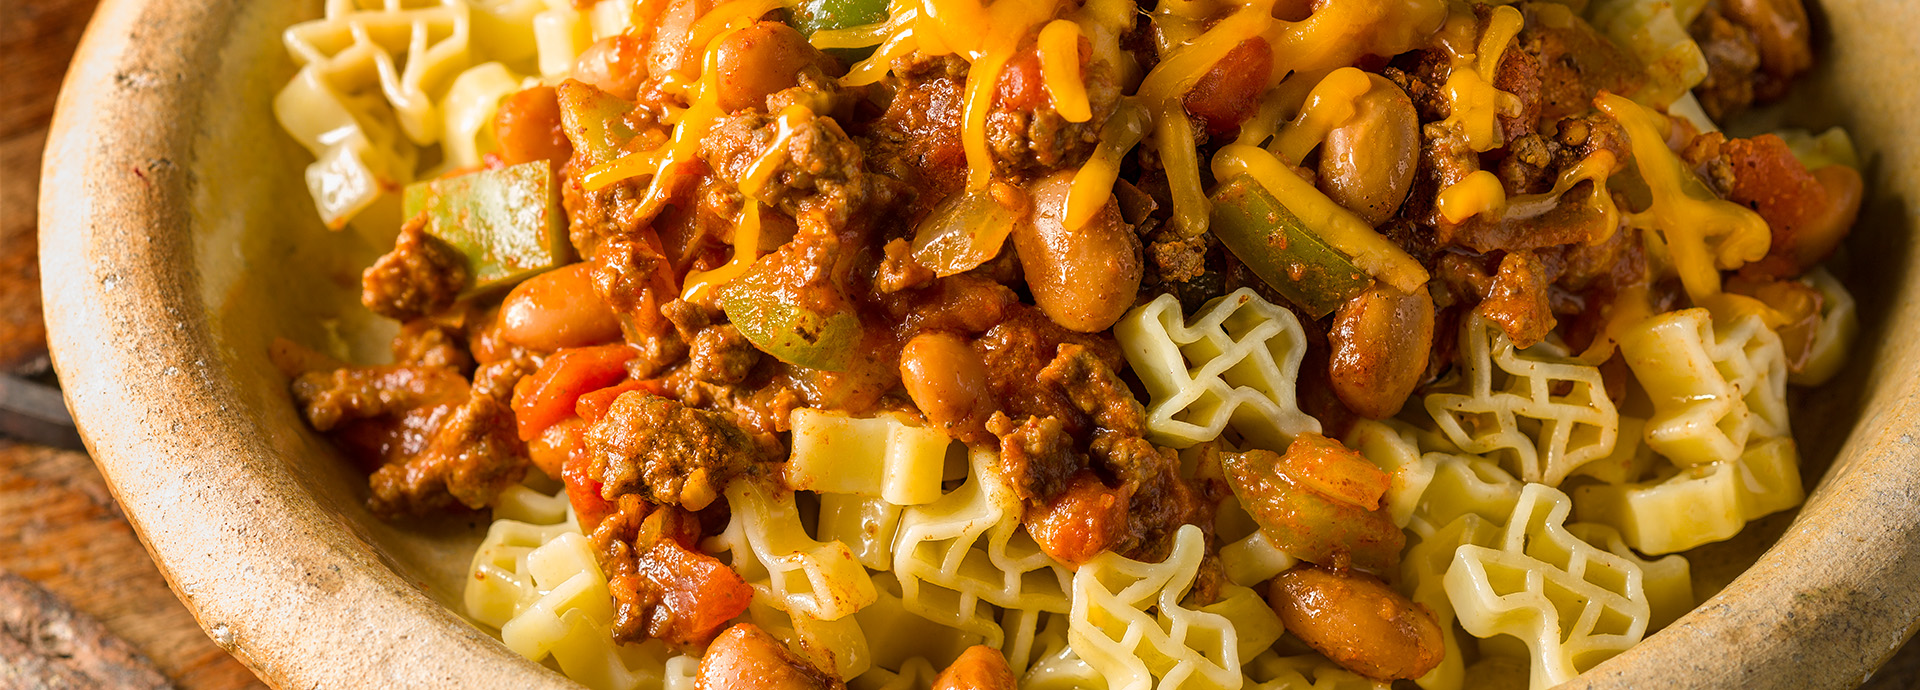 Non Pasta Ground Beef Recipes